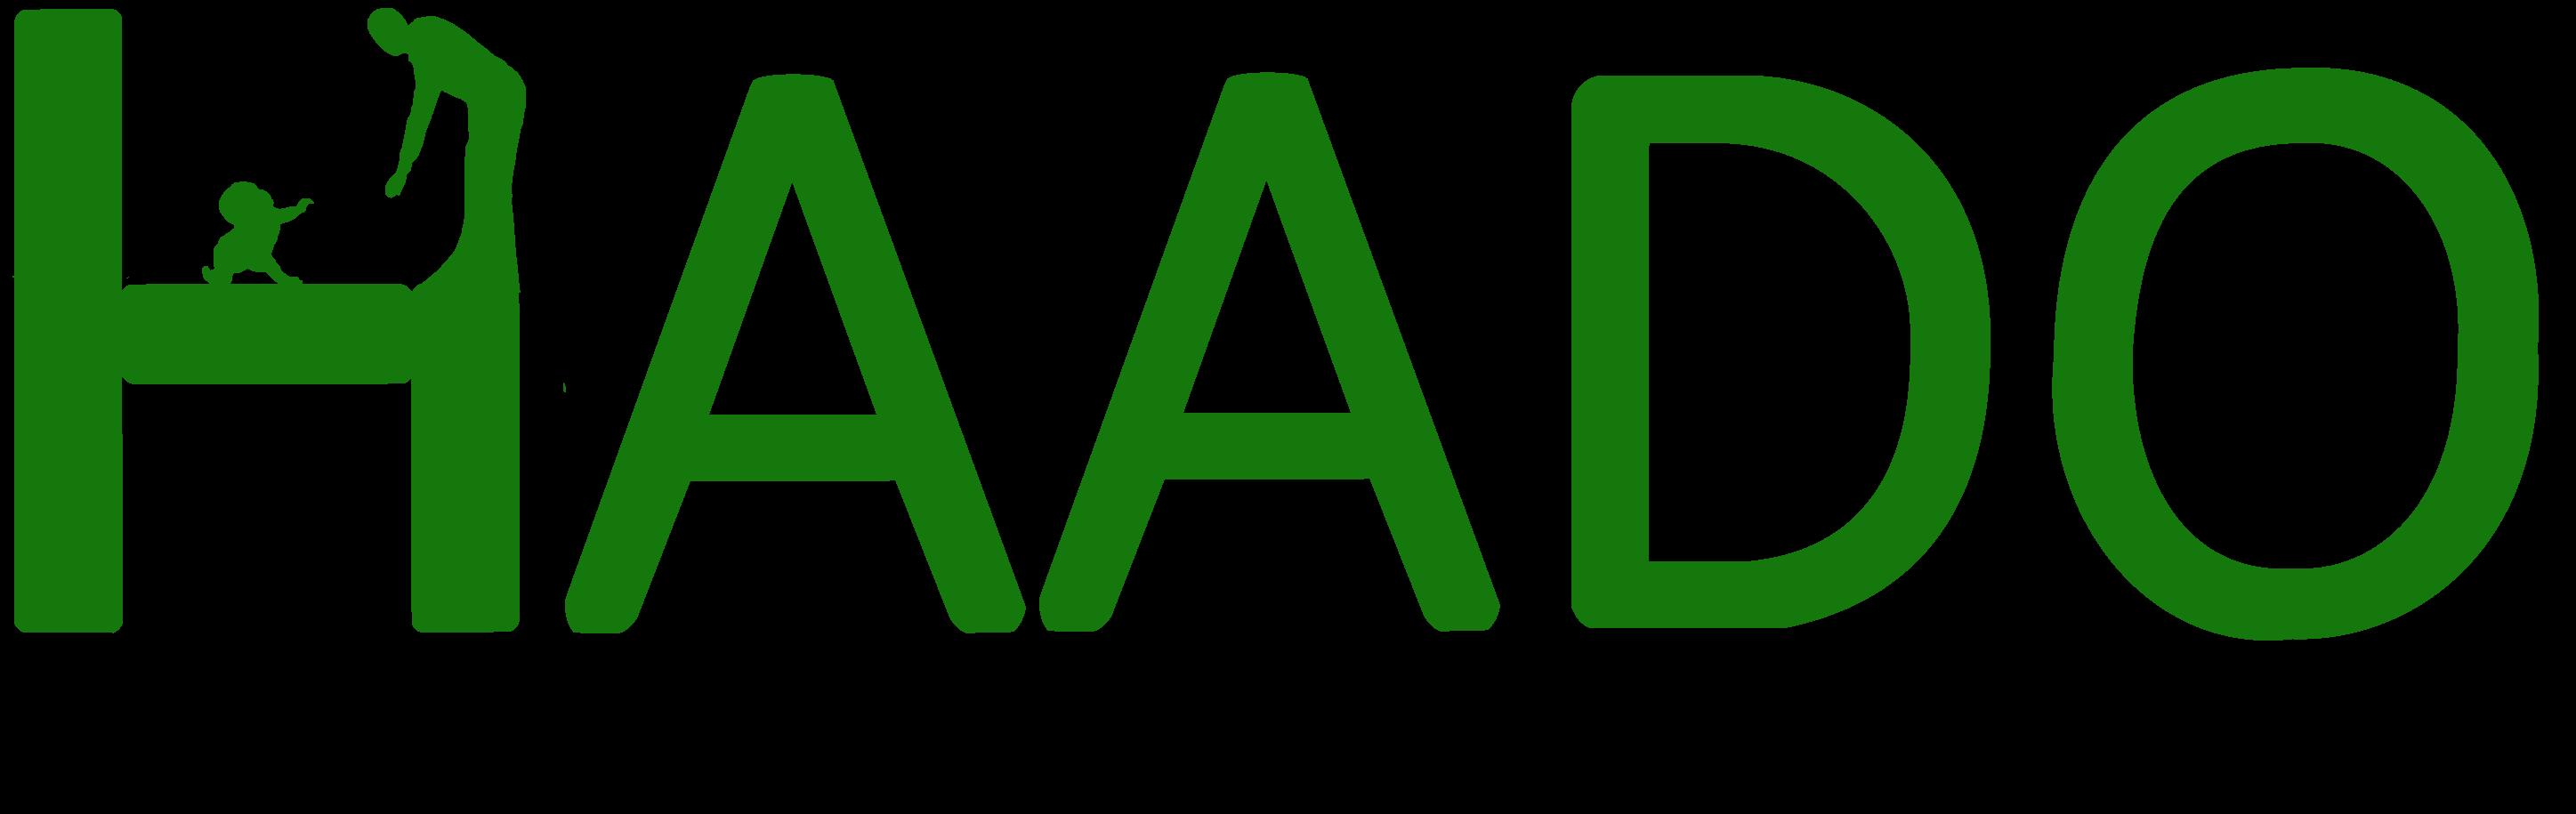 HAADO Org